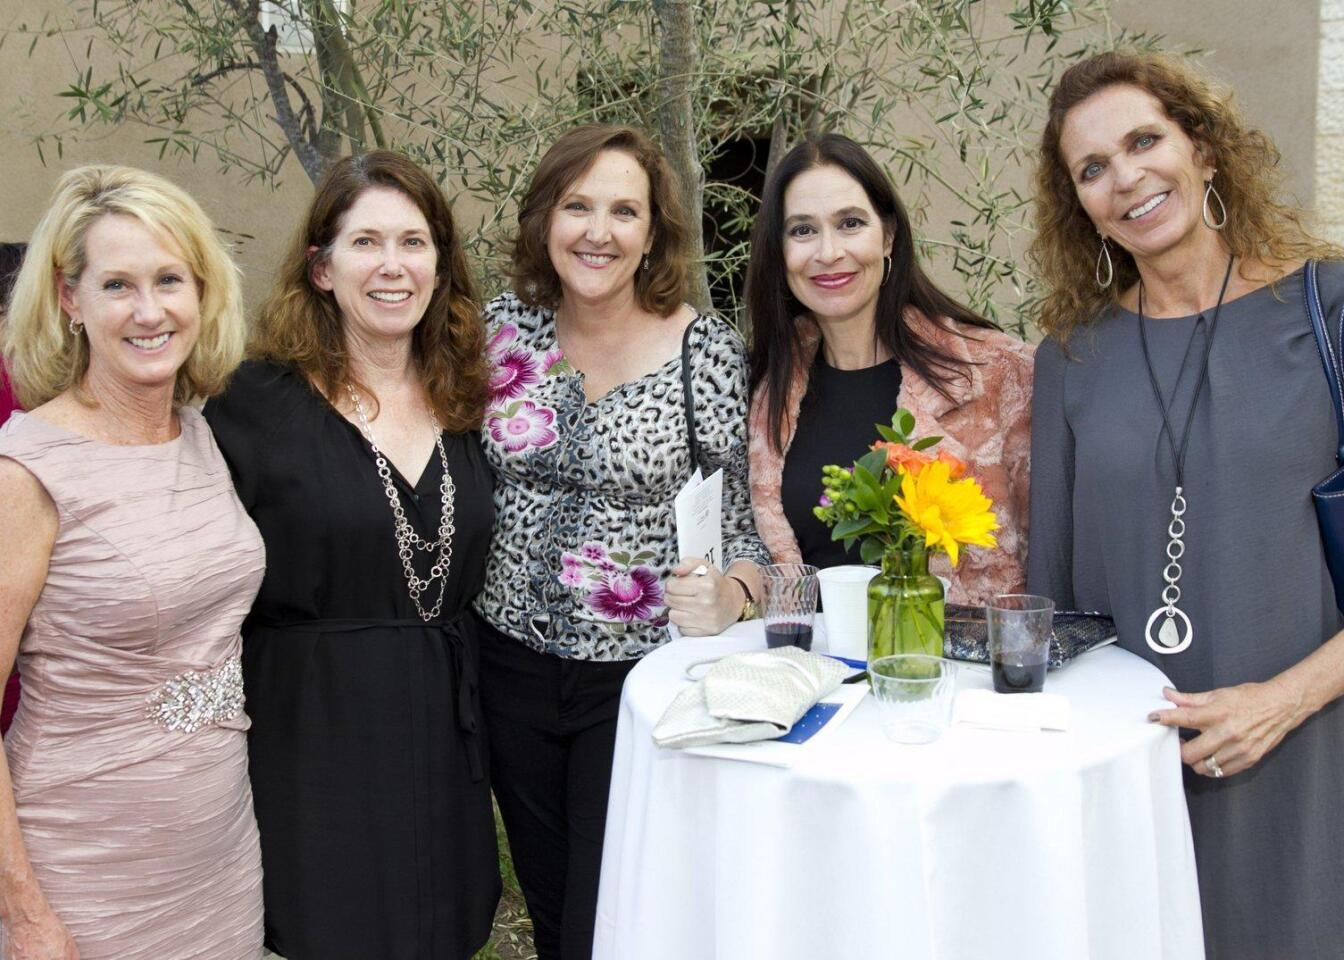 Carol Gunness, Kelly Hughes, Corie Heinzelmann, Alexa Saxon, Christy Hines